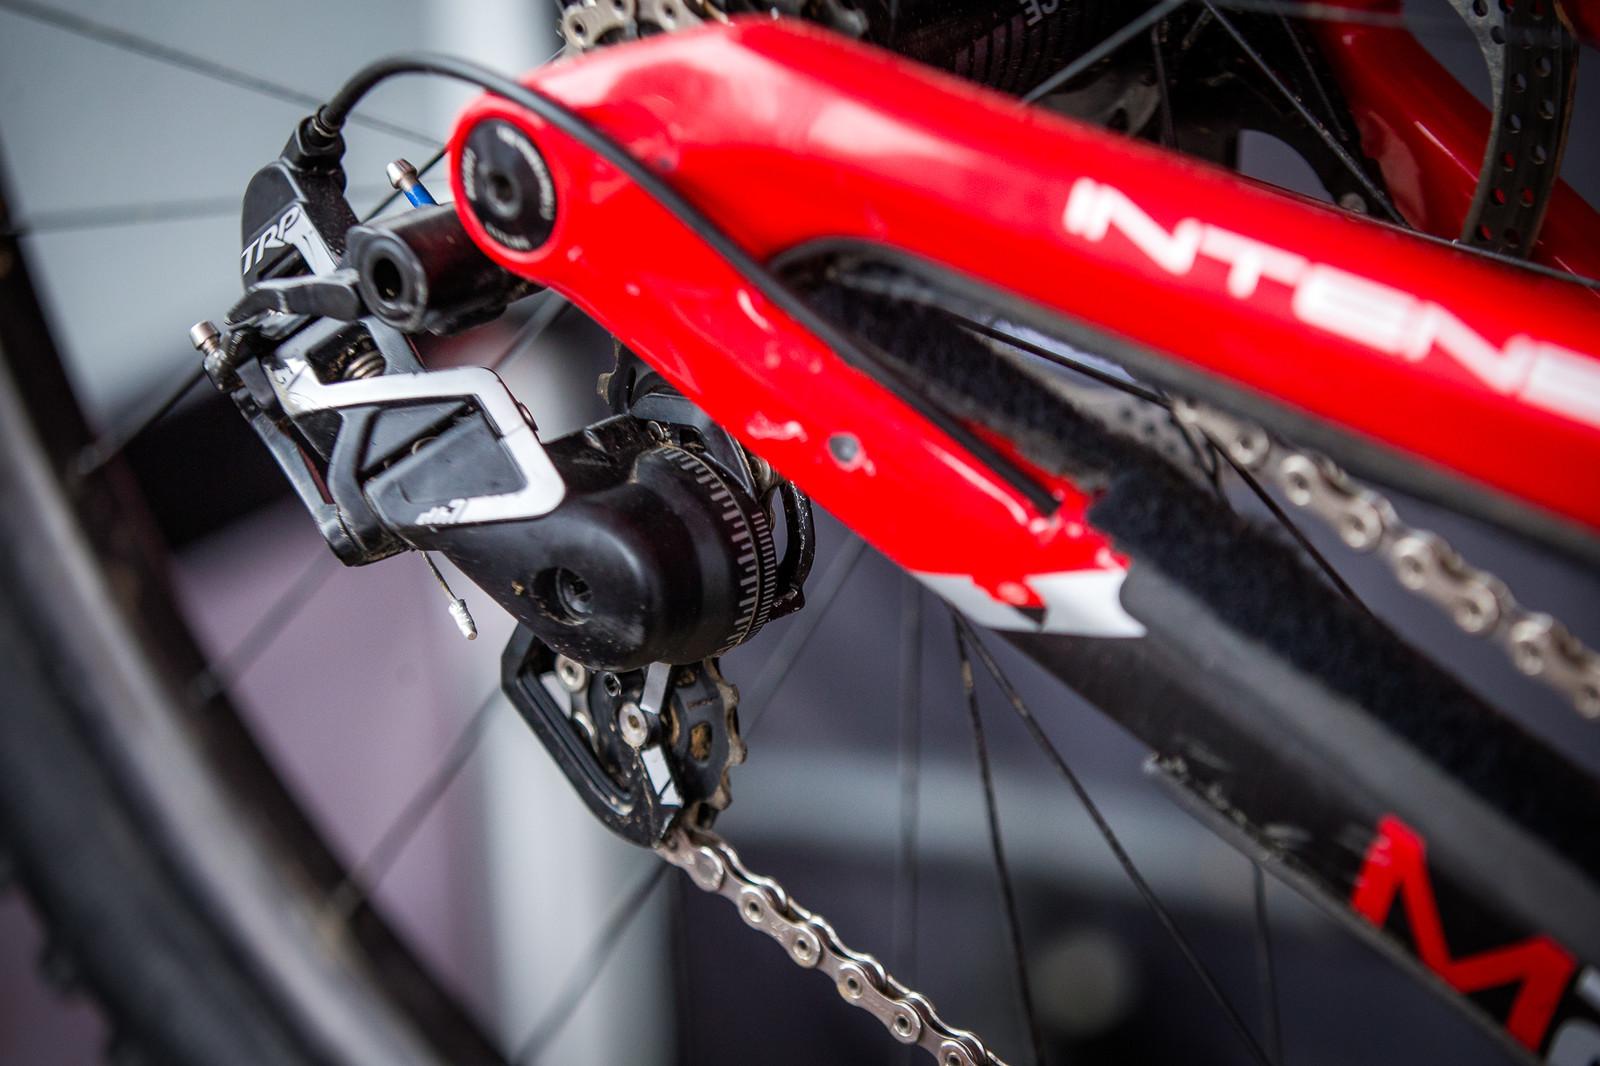 7-Speed TRP Rear Derailleur on Neko's Bike - PIT BITS - 2019 Windrock Tennessee National Pro GRT  - Mountain Biking Pictures - Vital MTB